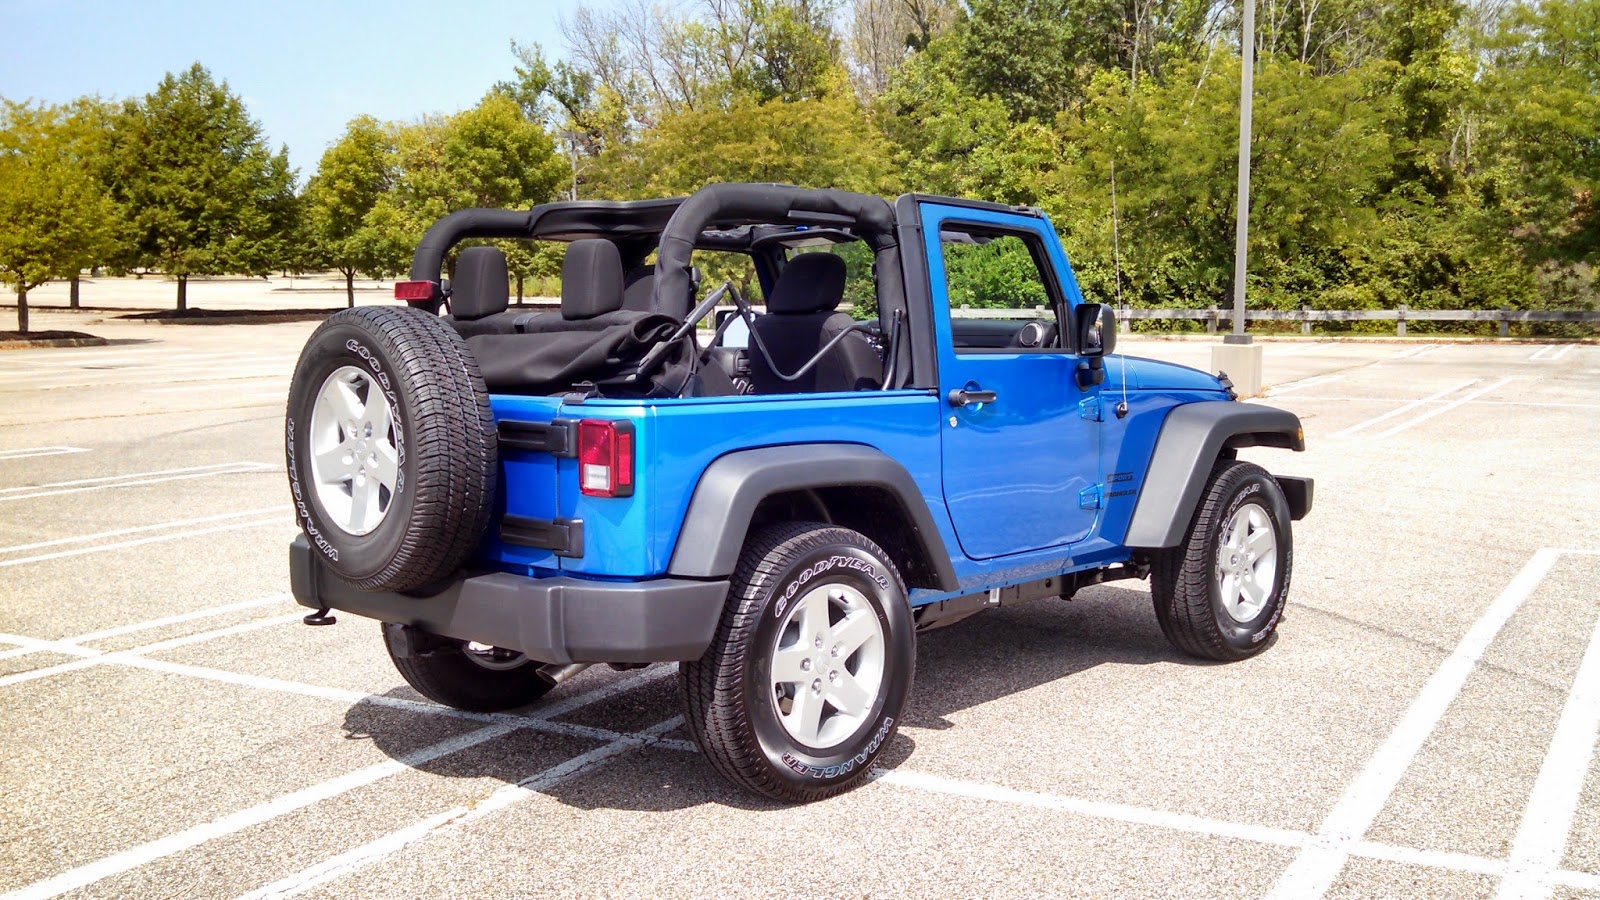 2015 Wrangler Jk Sport Test Drive Wranglerforumcom Addition Jeep Yj Sahara On 90 Hose Diagram Exterior No Major Surprise Here It Looks Like A Not Much Else To Say